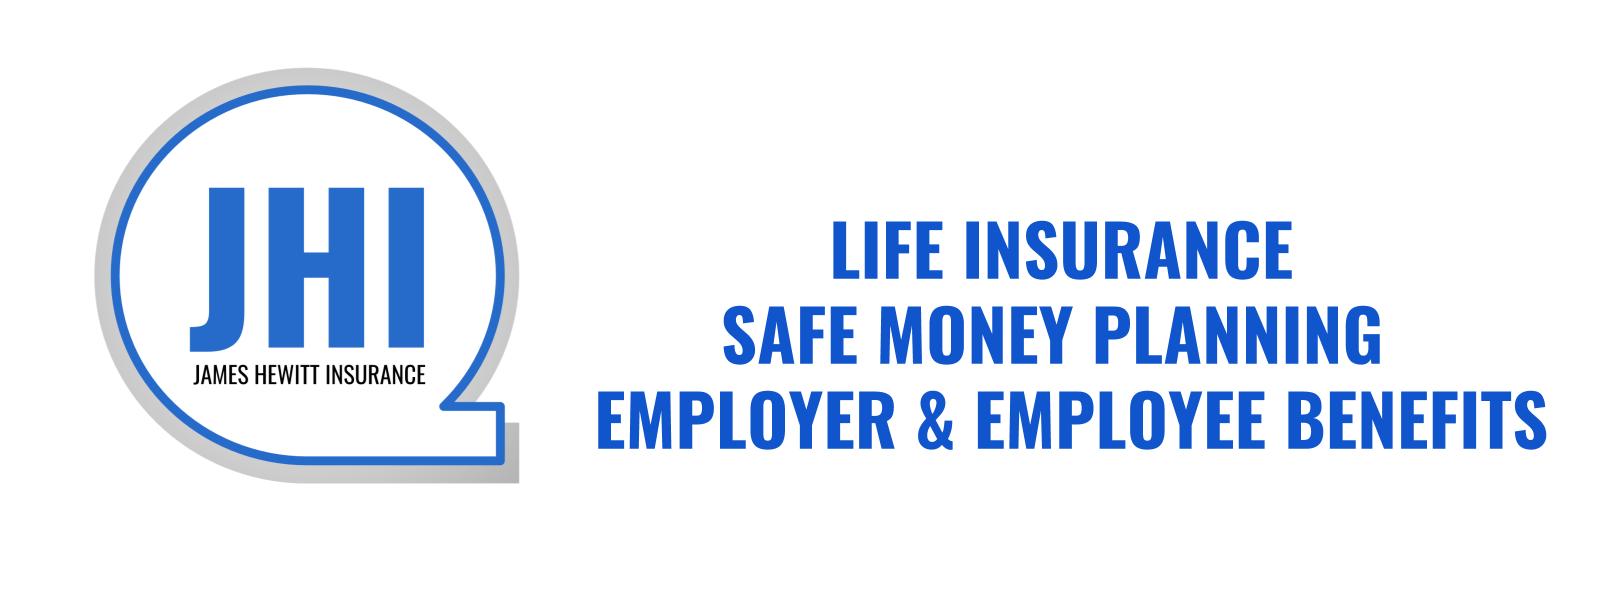 James Hewitt Insurance image 26